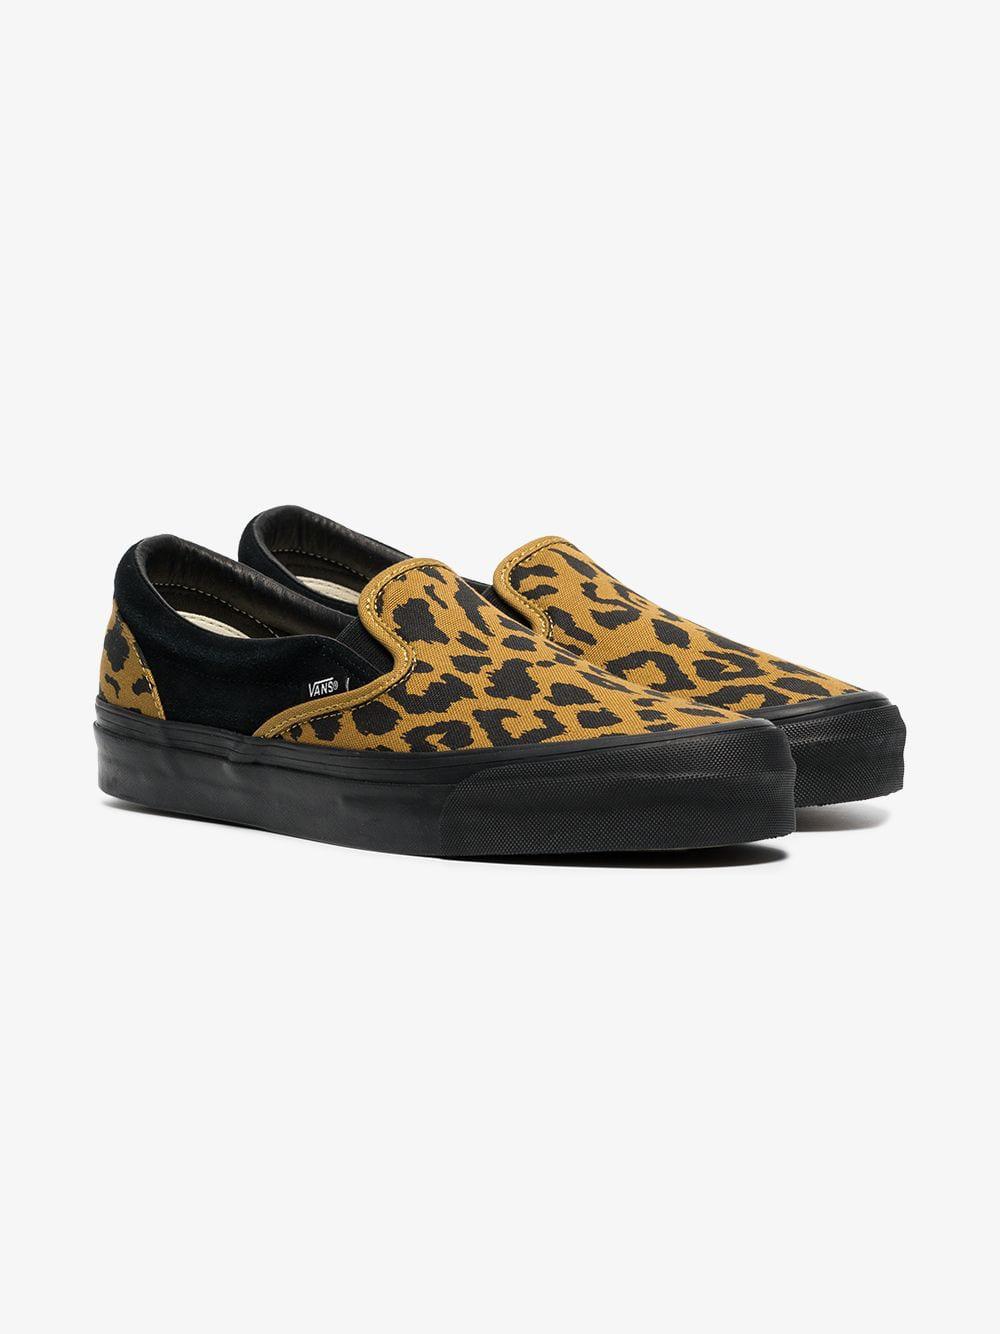 ee4c76505c Vans Black And Yellow Vault Ua Og Leopard Print Slip On Sneakers ...